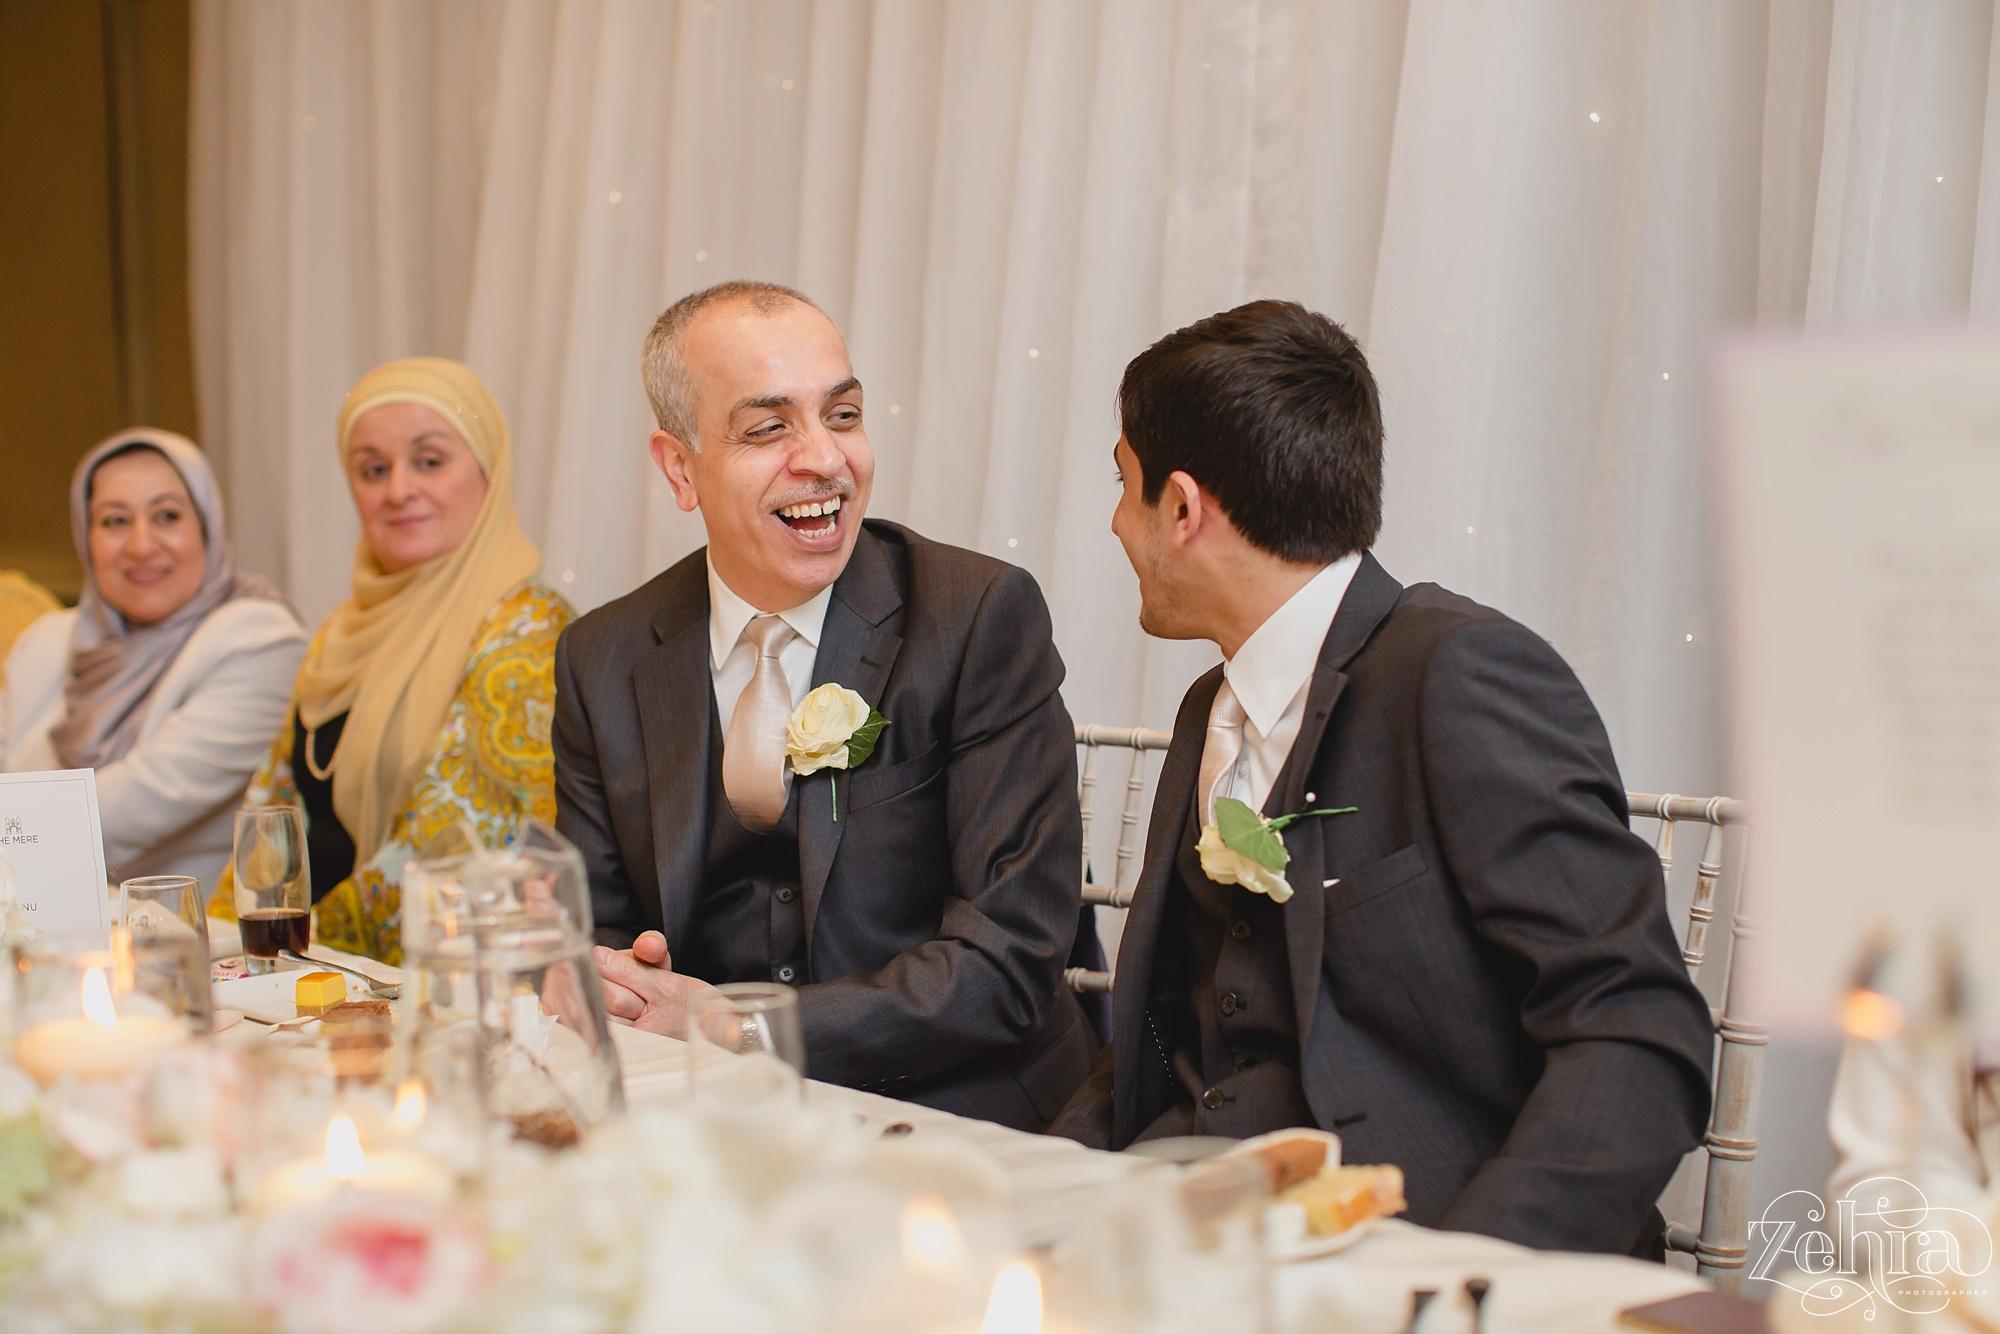 zehra photographer mere cheshire wedding_0055.jpg